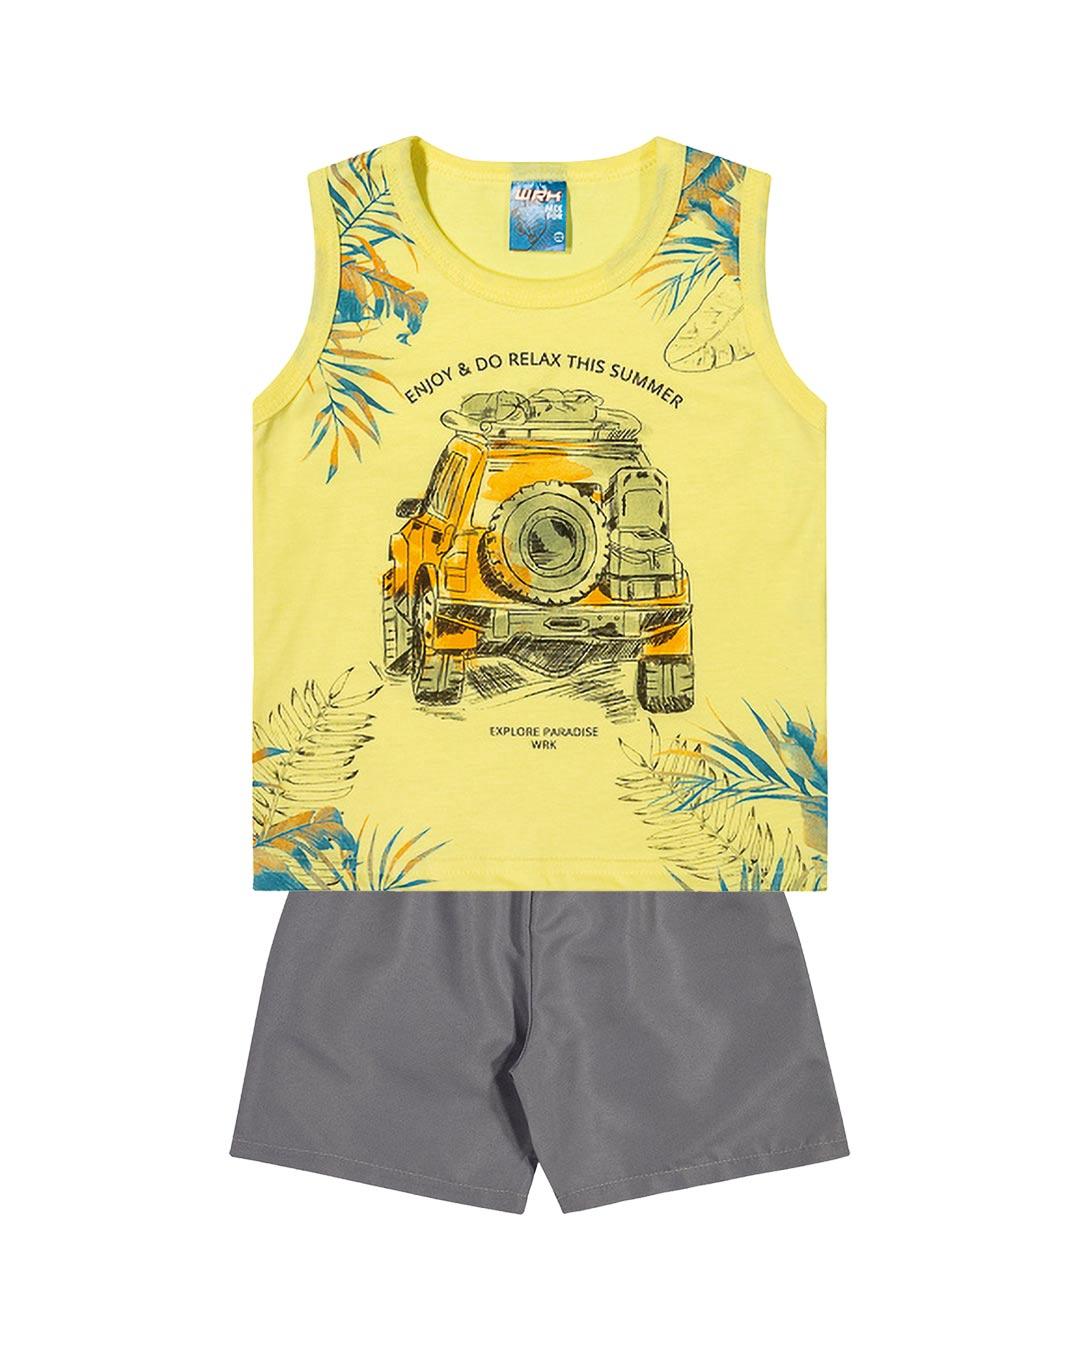 Conjunto Infantil Enjoy & Do Relax This Summer - WRK